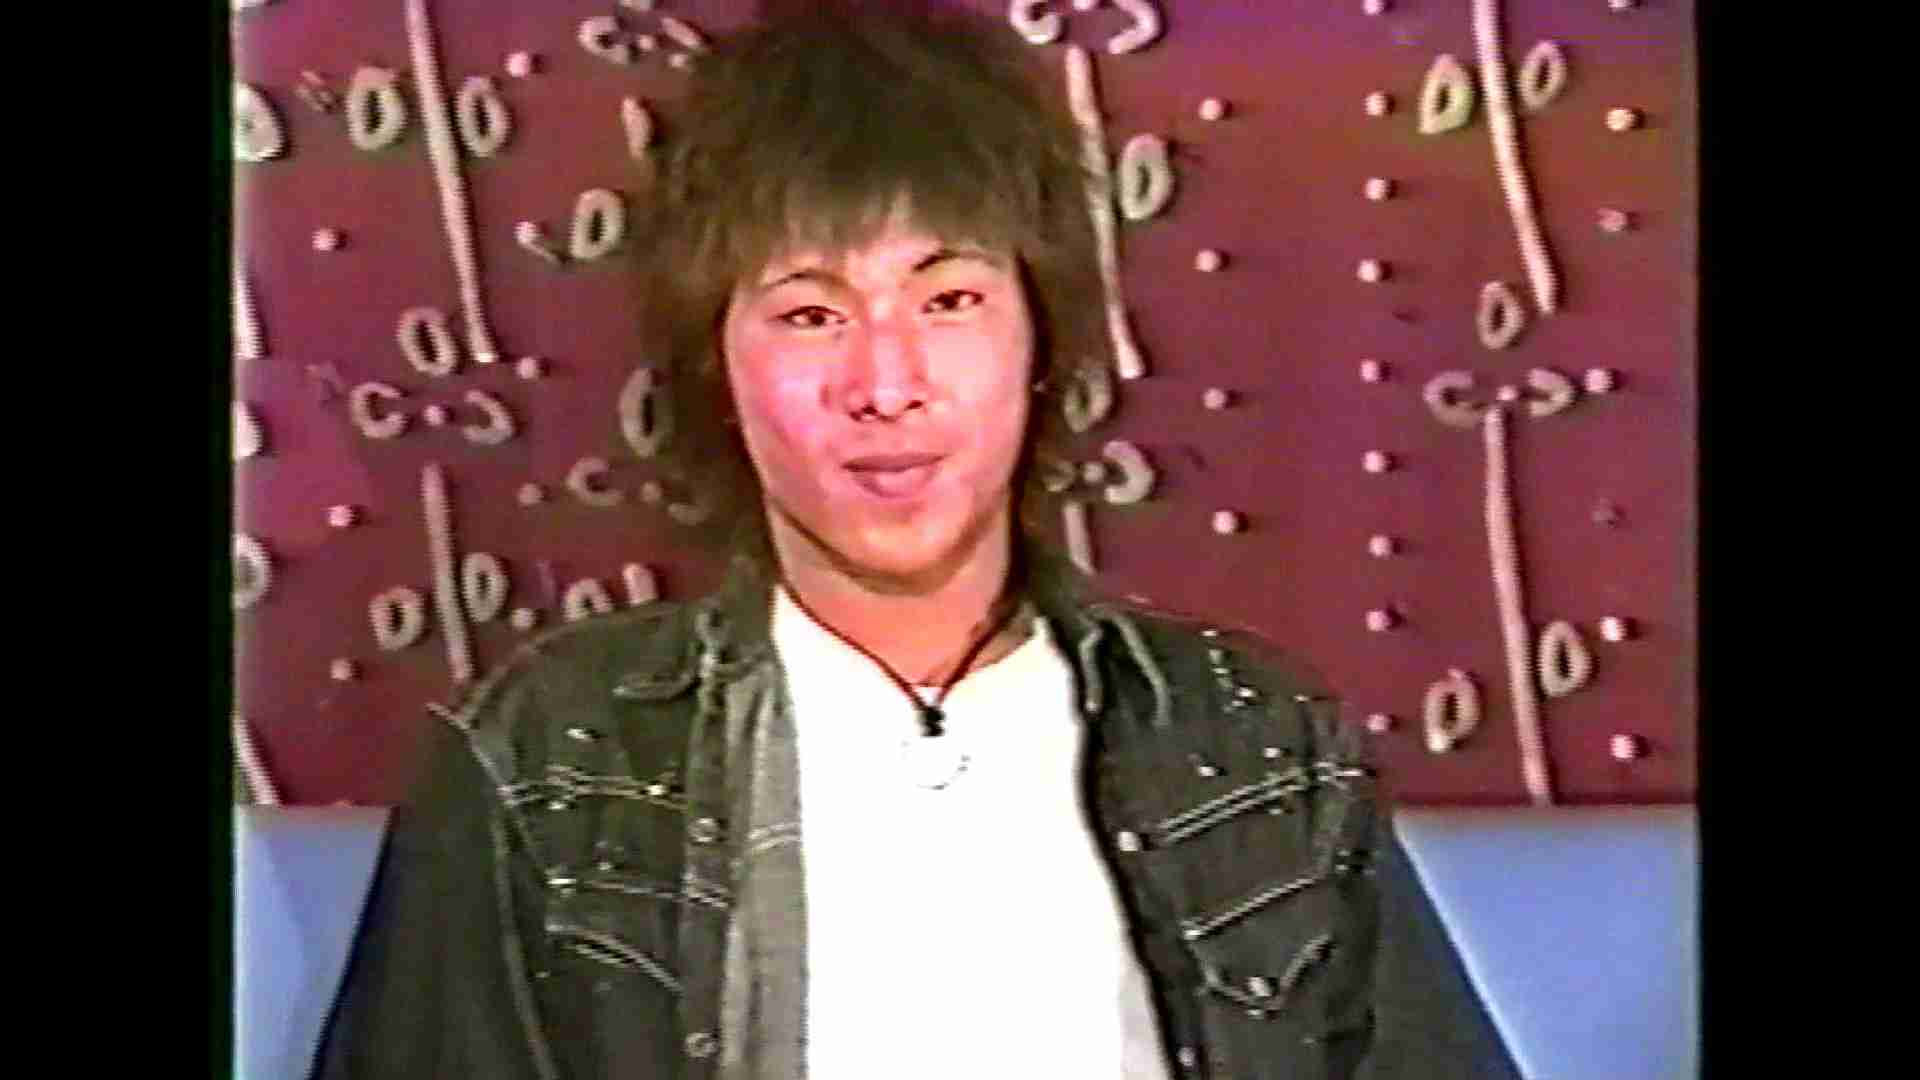 GAYBOY宏のオカズ倉庫Vol.3-1 完全無修正  89pic 25